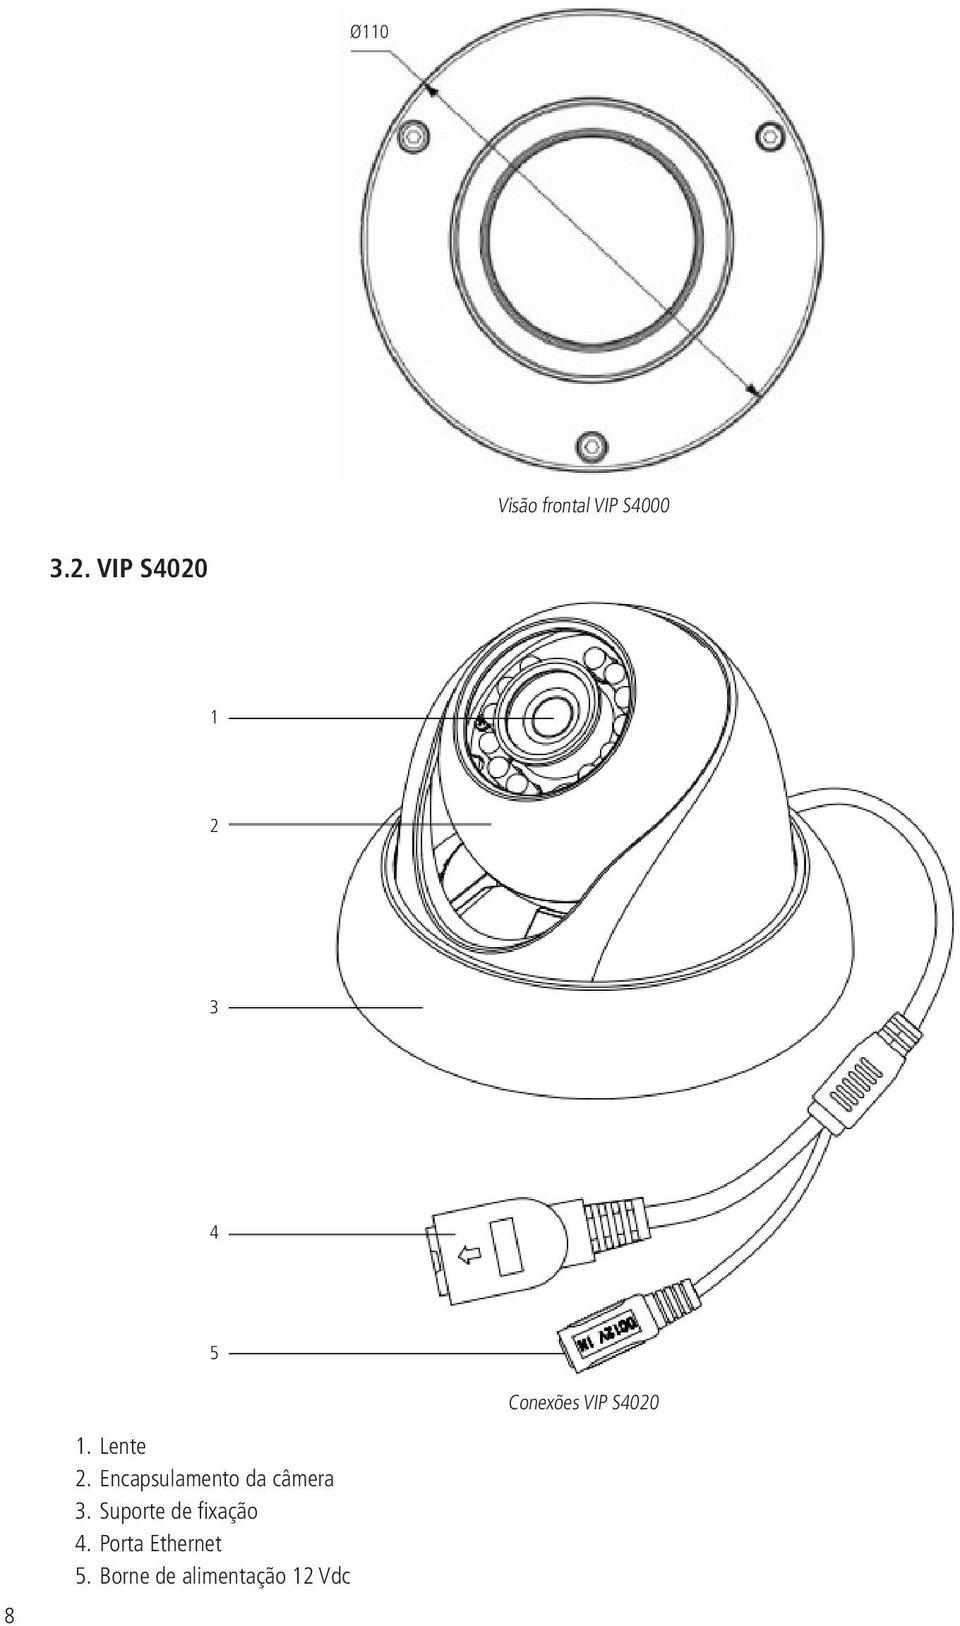 Manual do usuário Manual del usuario VIP S4000 VIP S4020